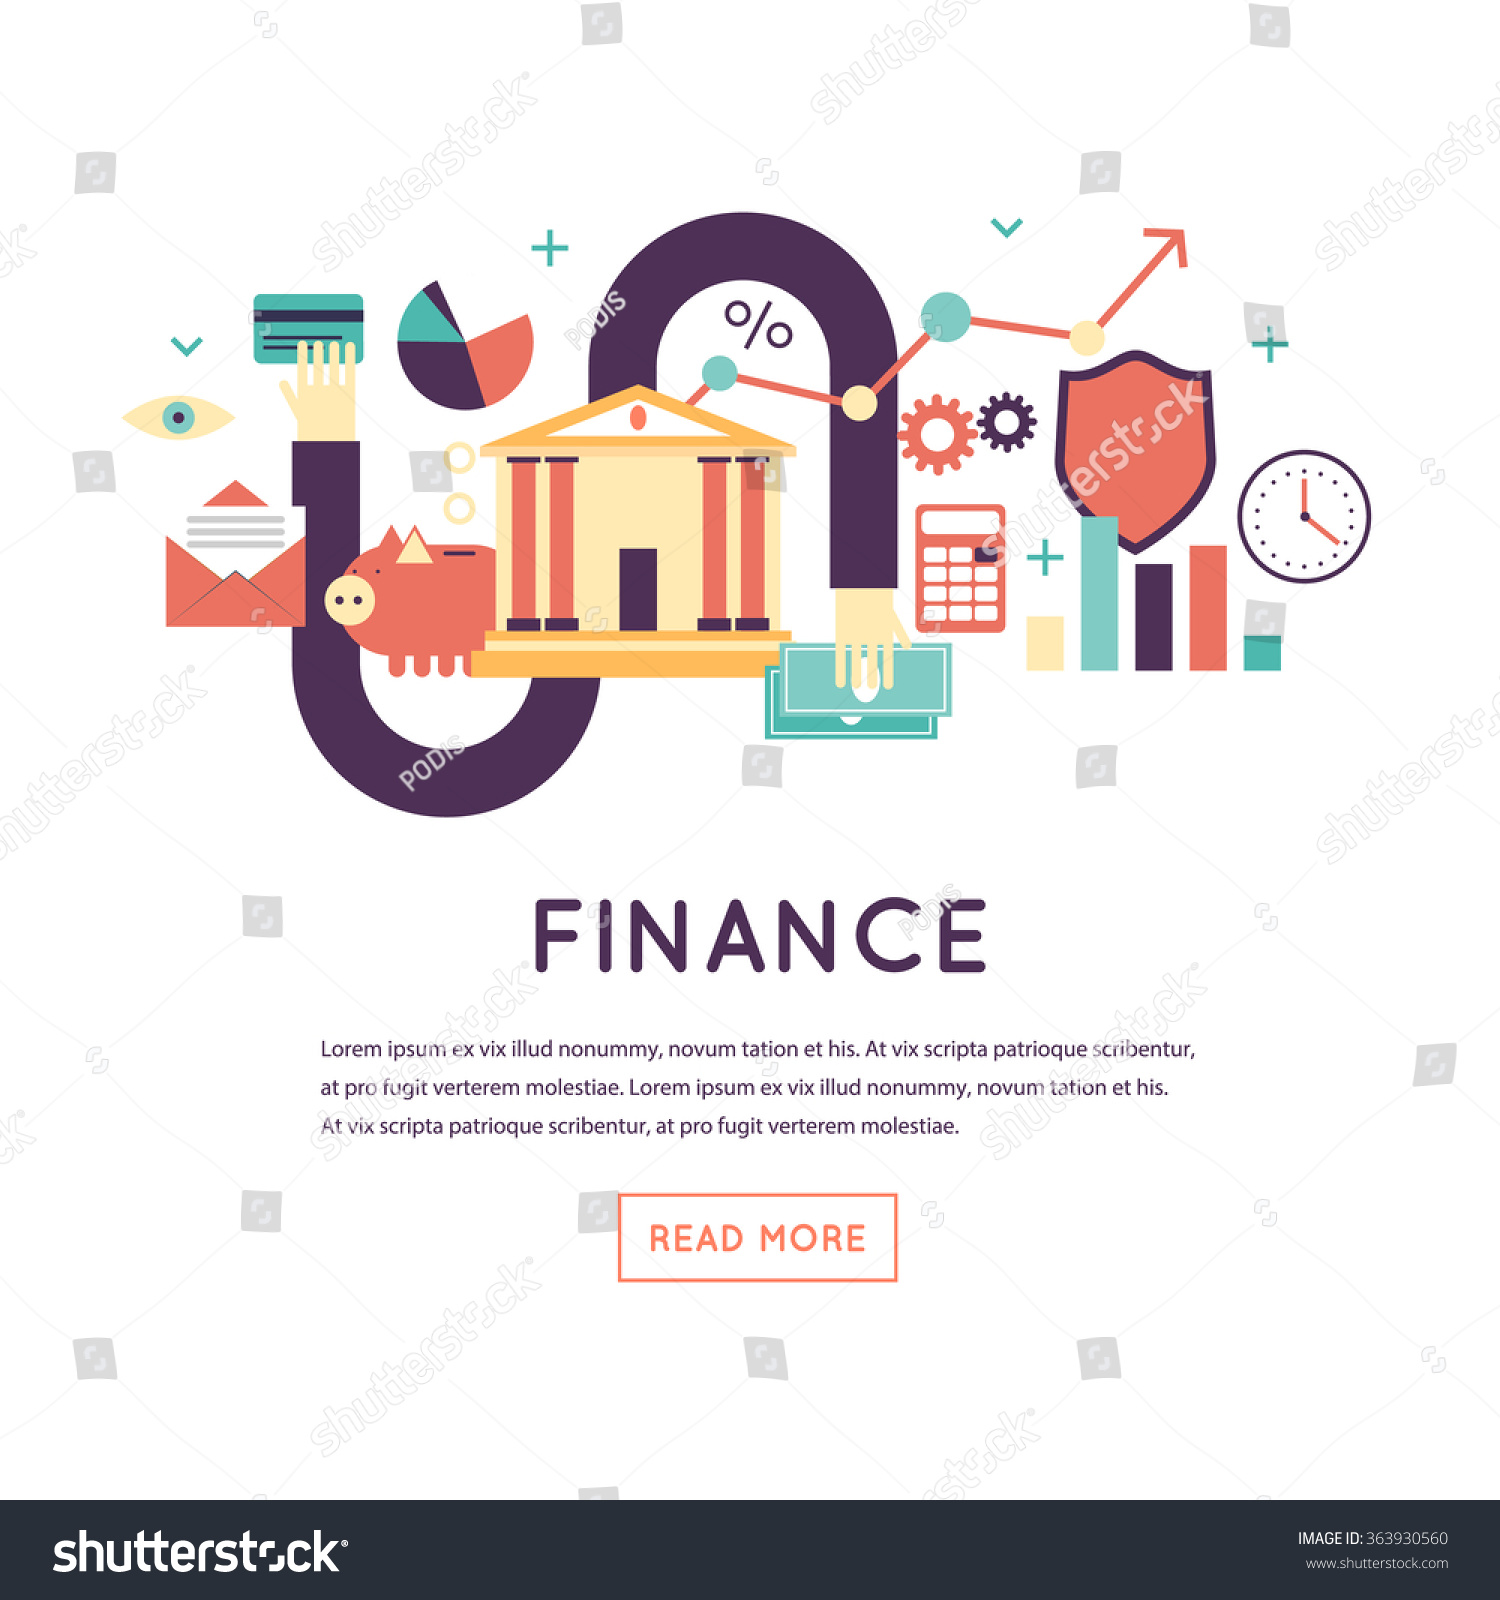 Soft Consultancy Companies Sdn Bhd (515262